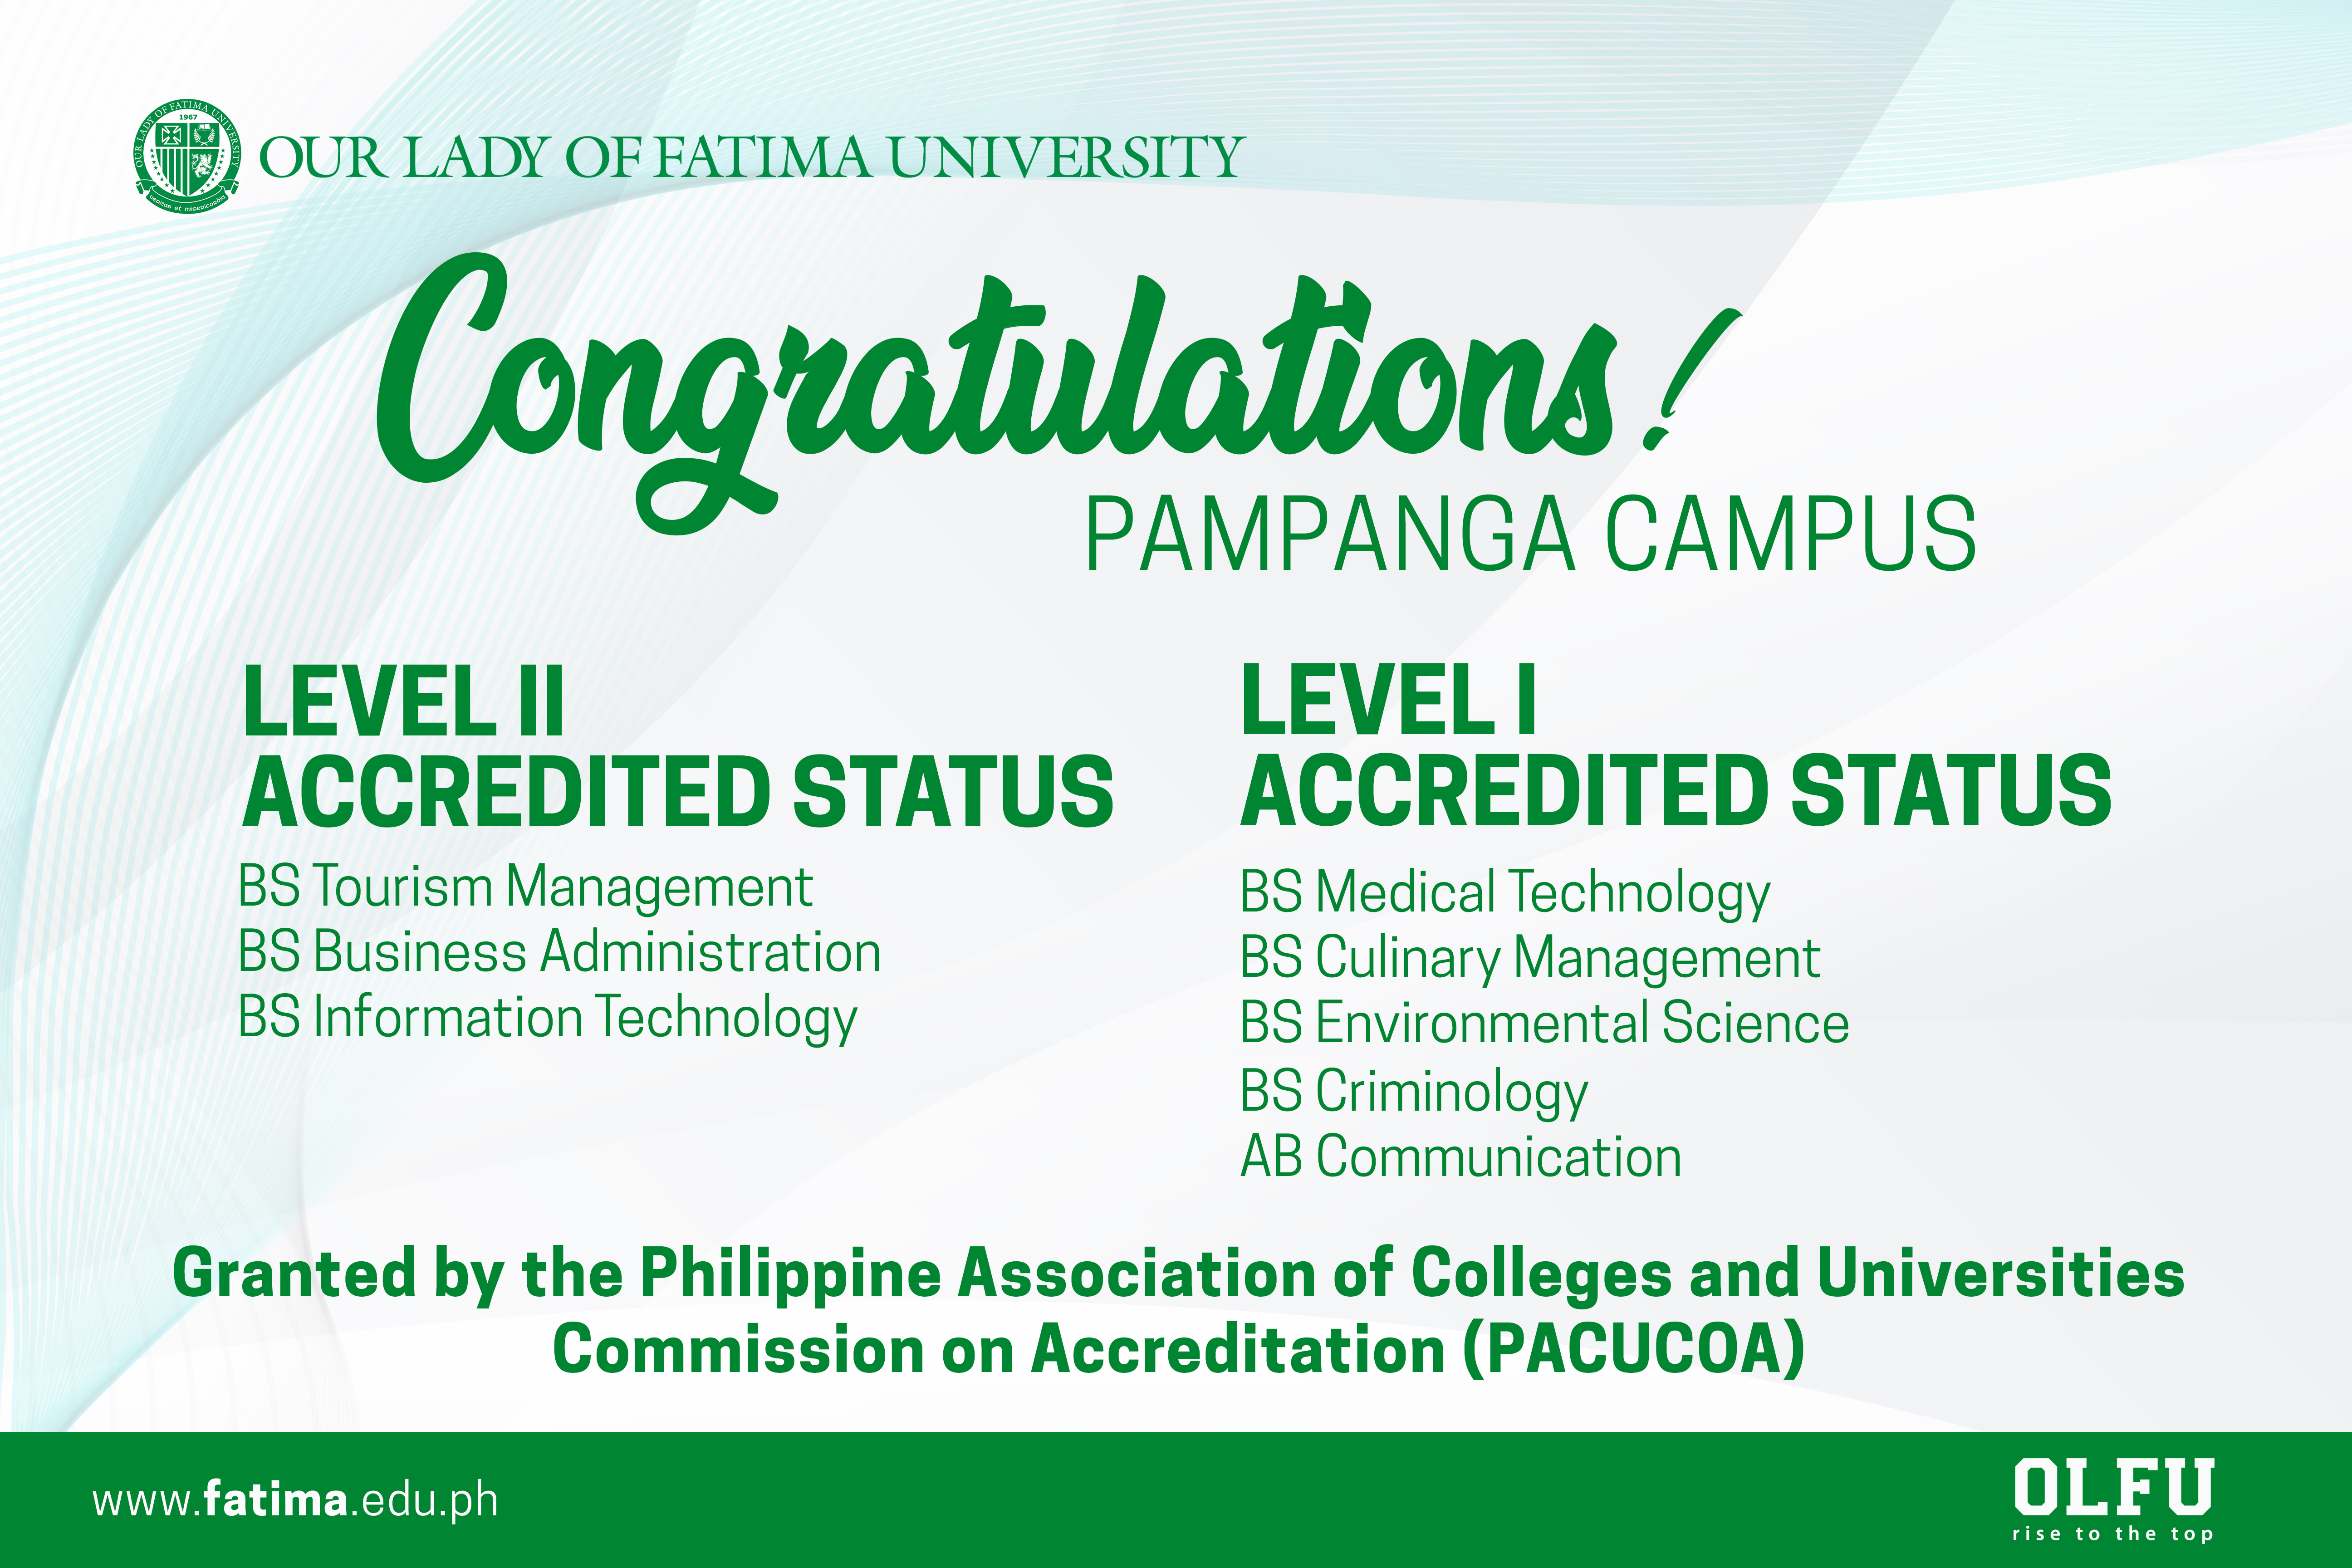 Pampanga Campus Programs earn Level I and II Accreditations